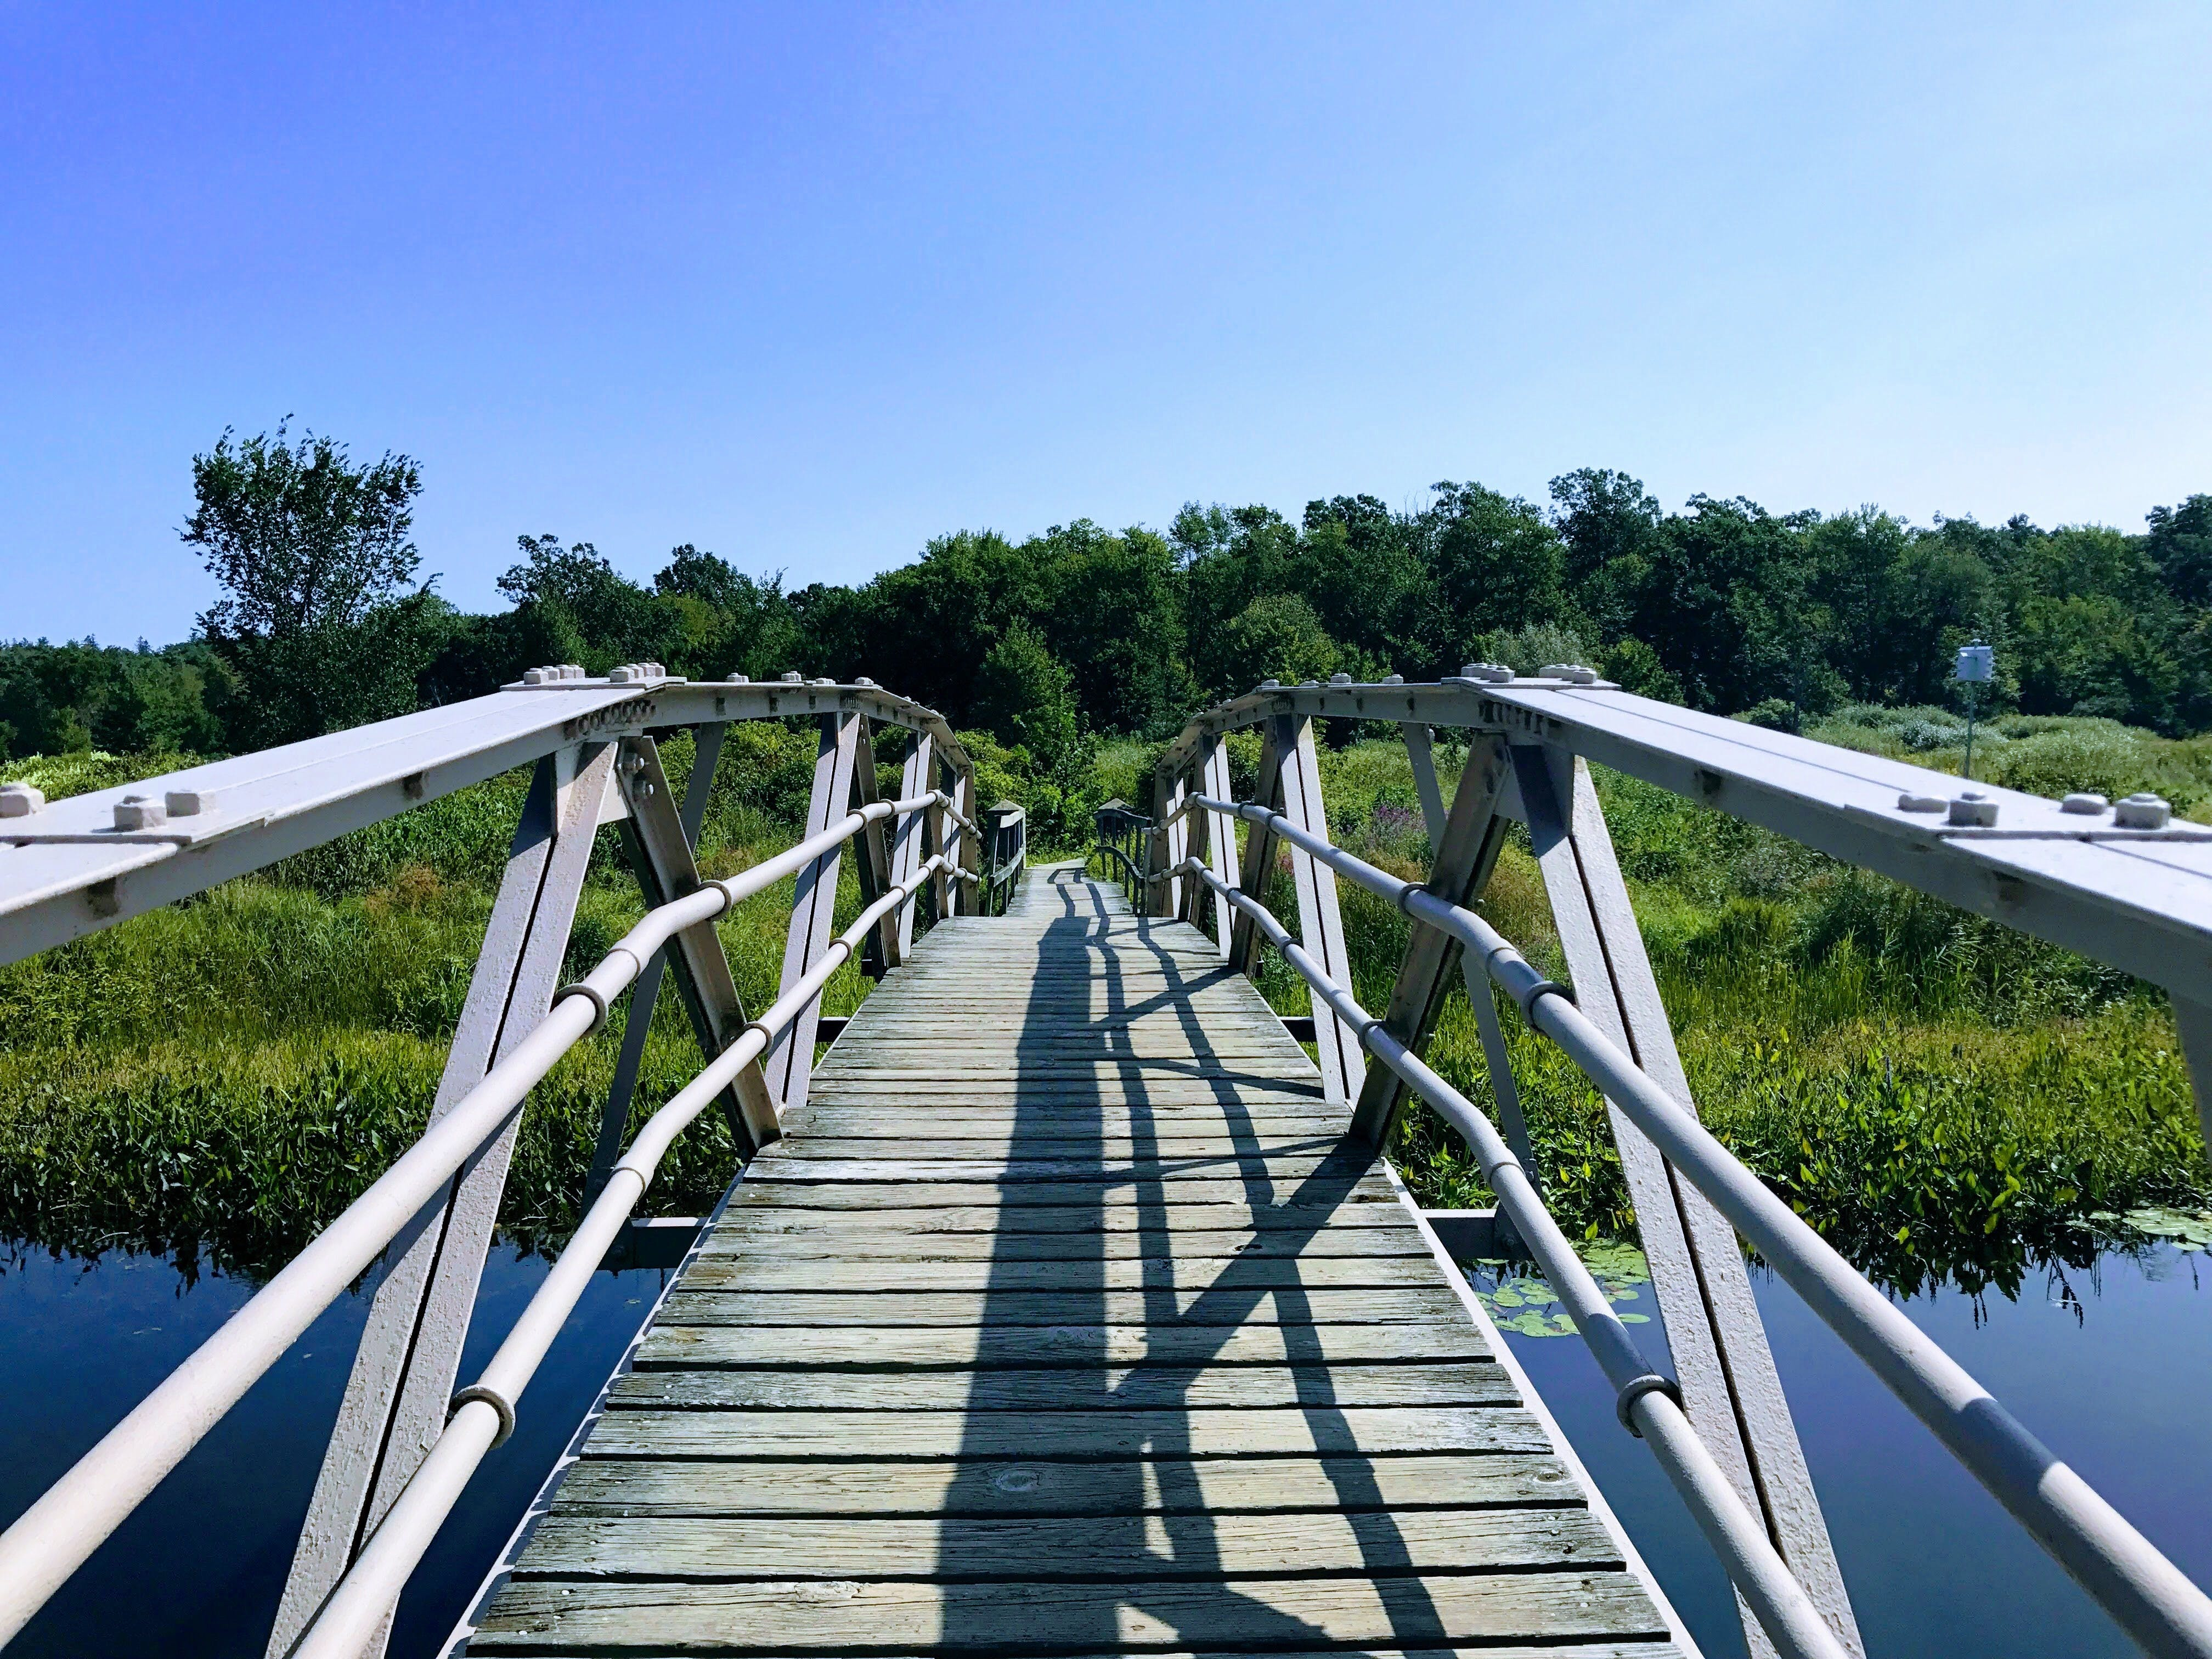 architecture, boardwalk, bridge